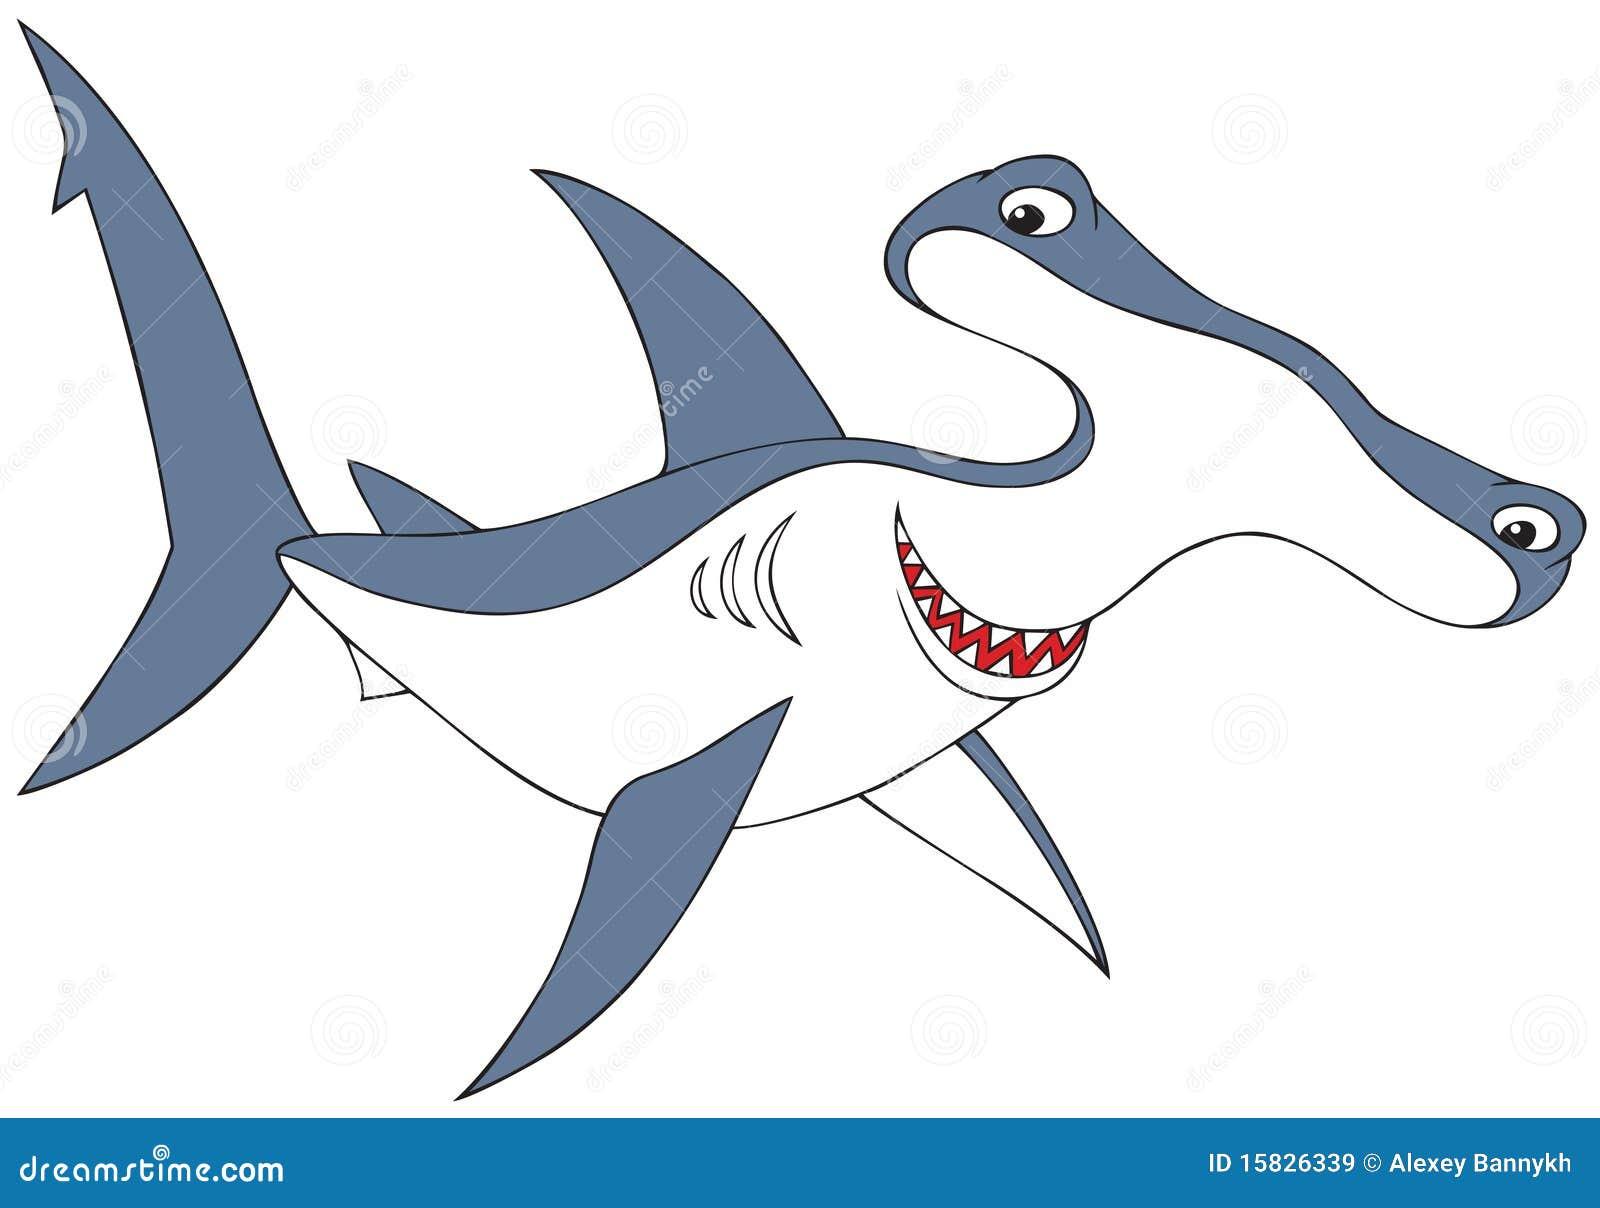 Imagenes De Tiburon Espada